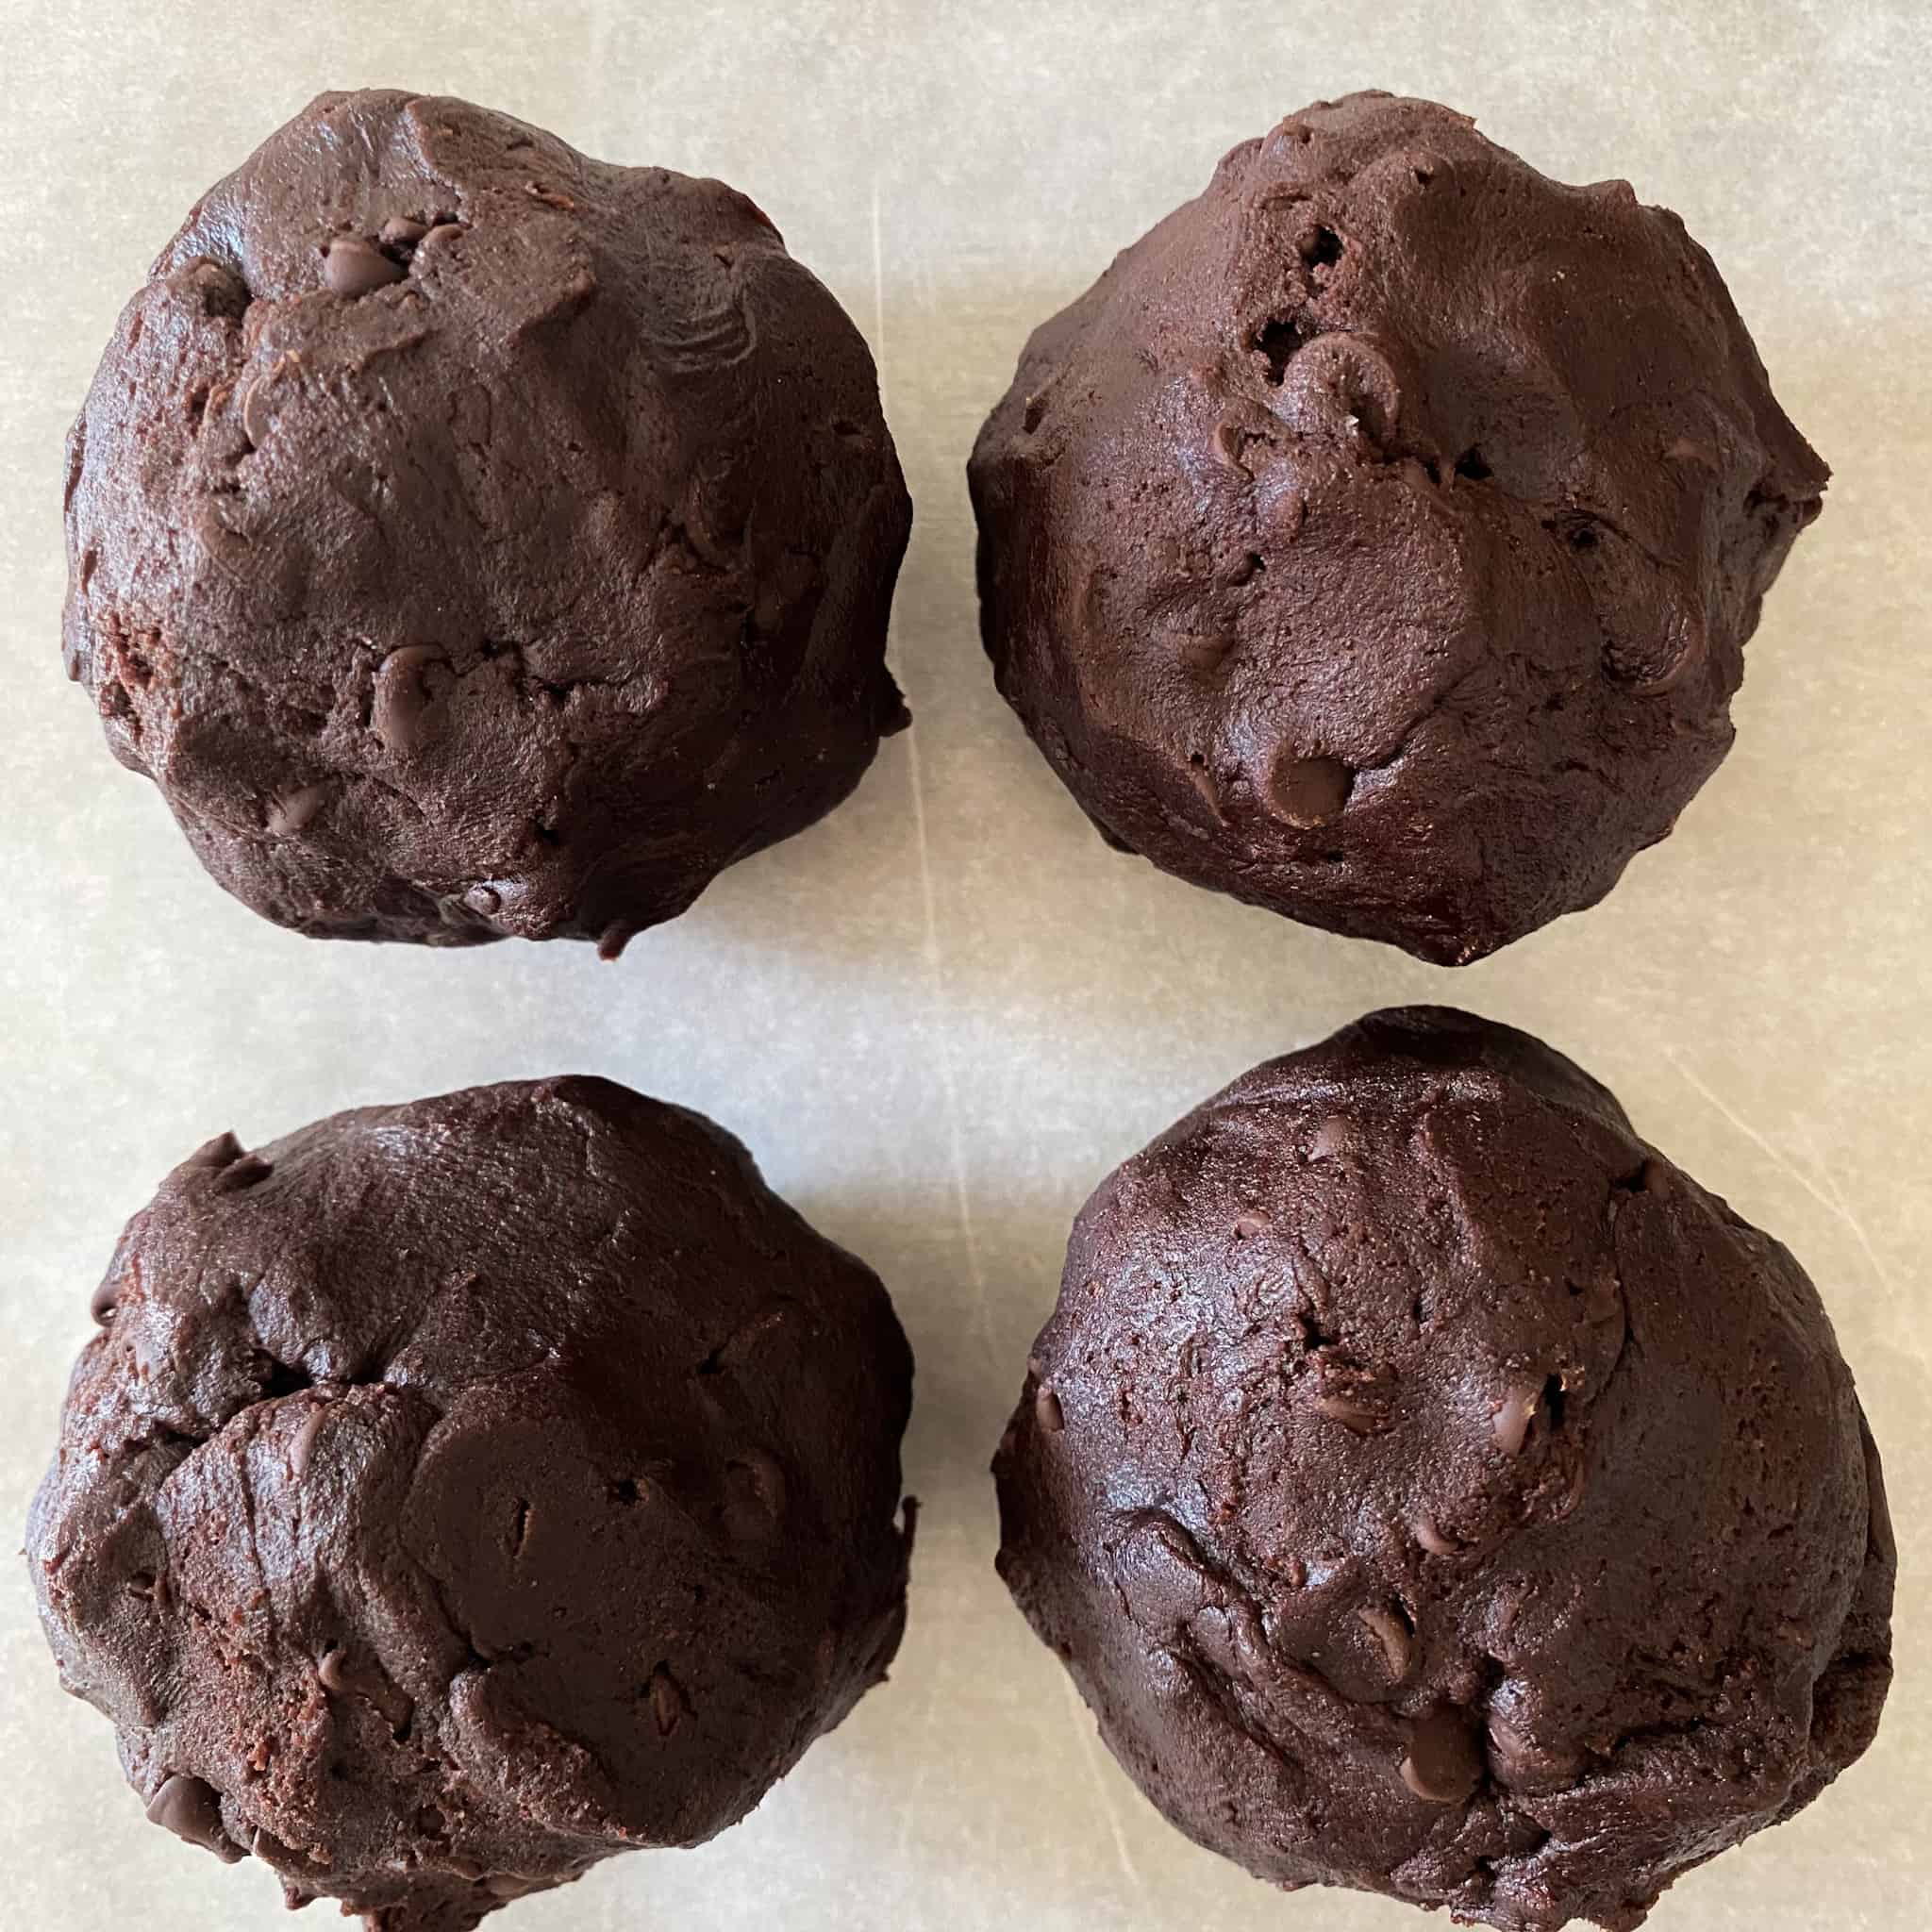 Four large dark chocolate dough balls on parchment paper